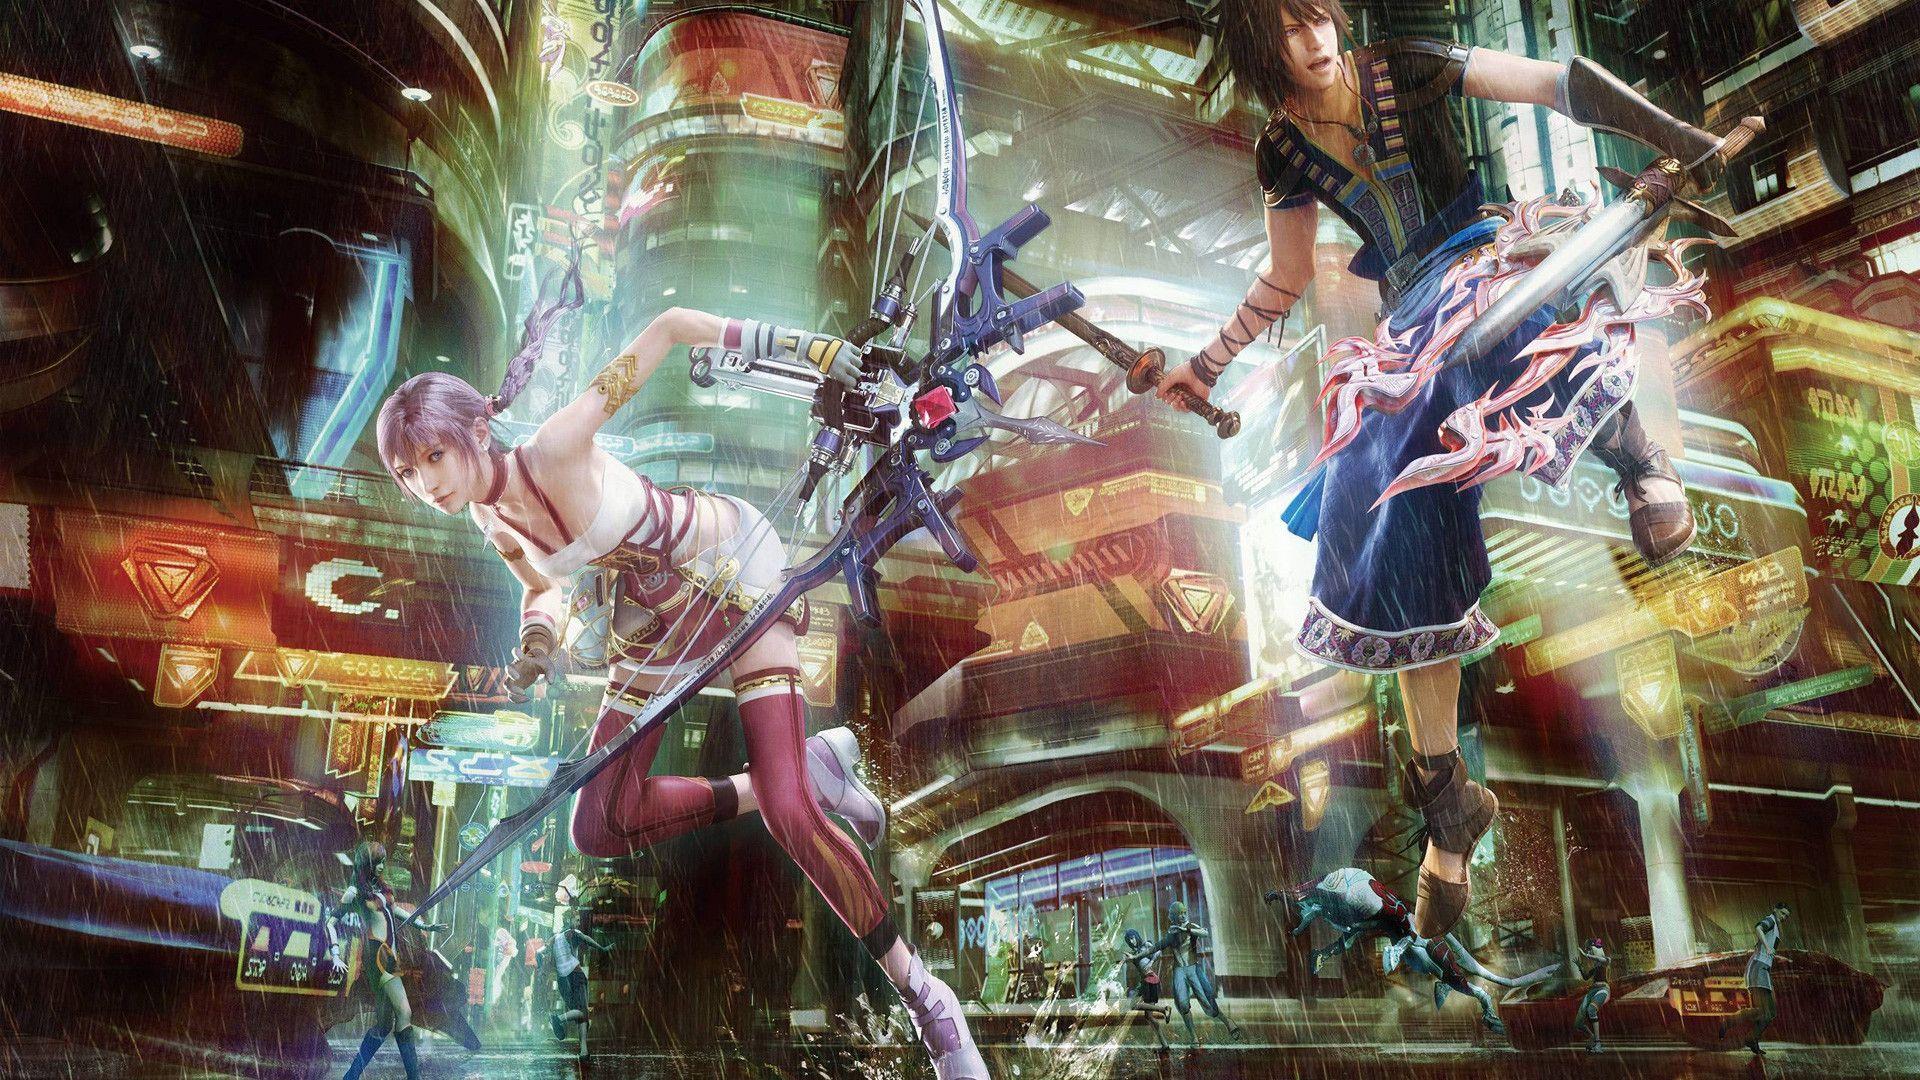 Final Fantasy Xiii Wallpapers 1080p - Wallpaper Cave